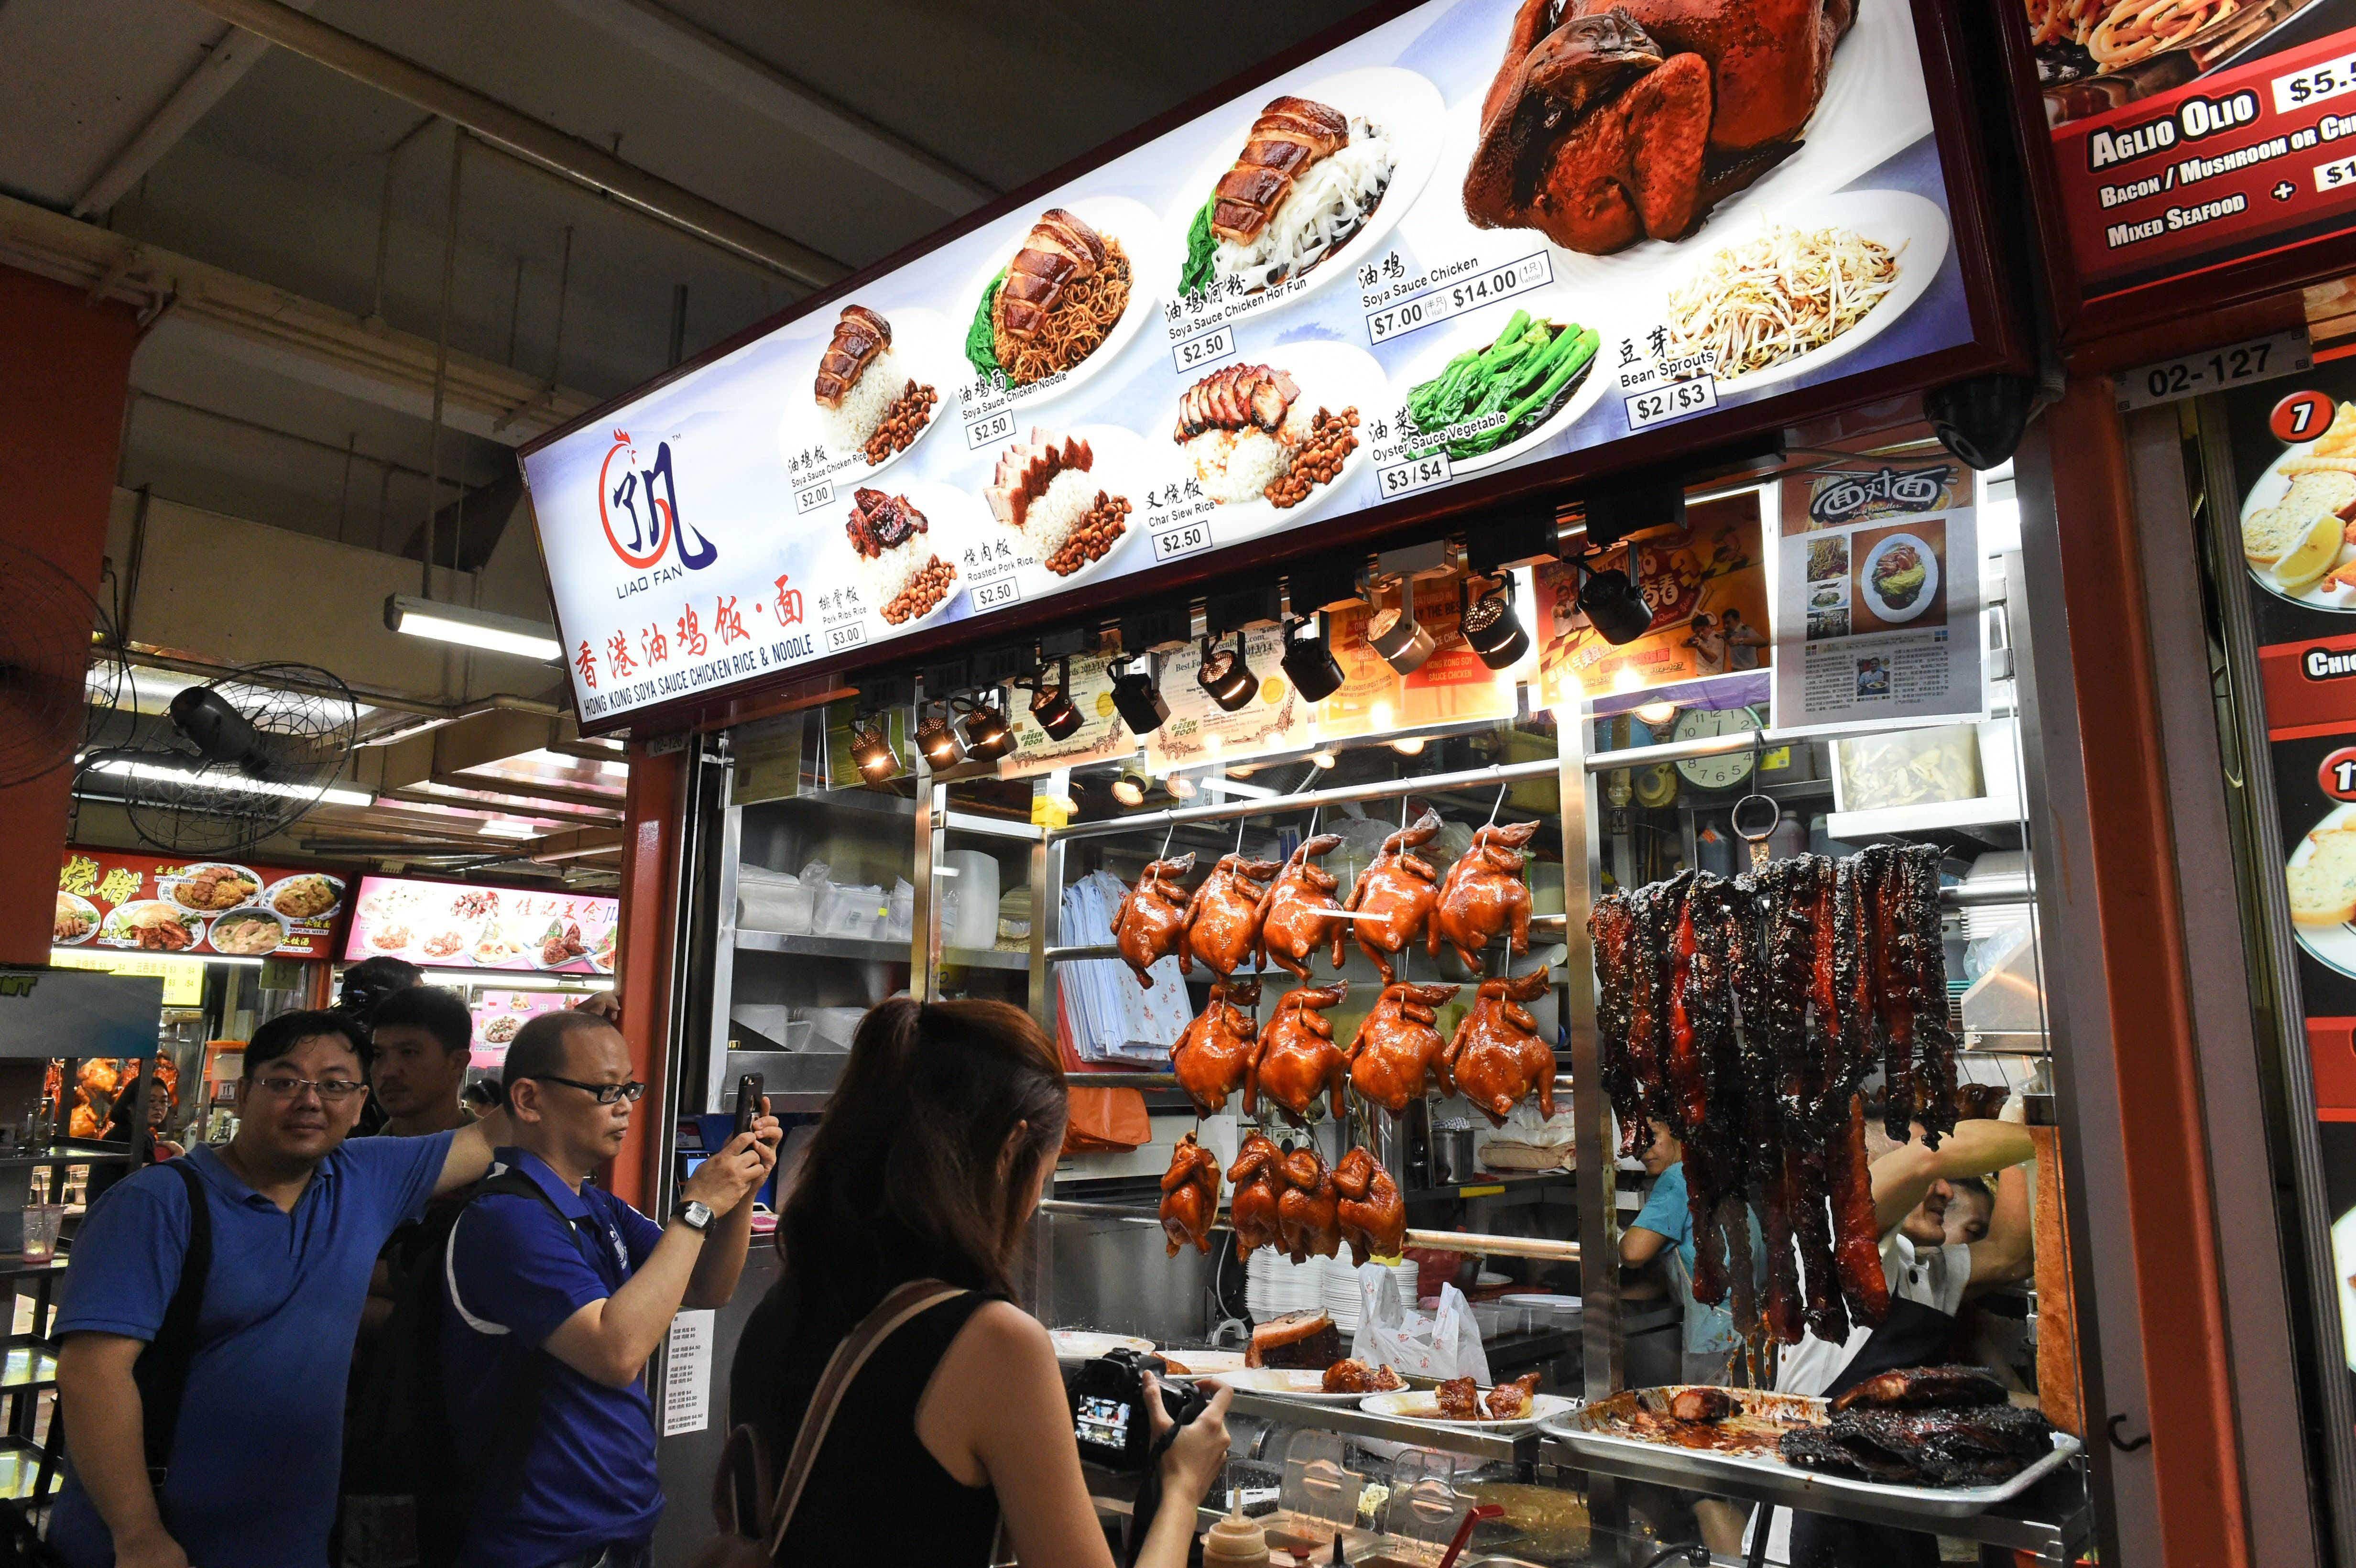 Singapore's famed Michelin-starred street food stall opens new spot in Jakarta